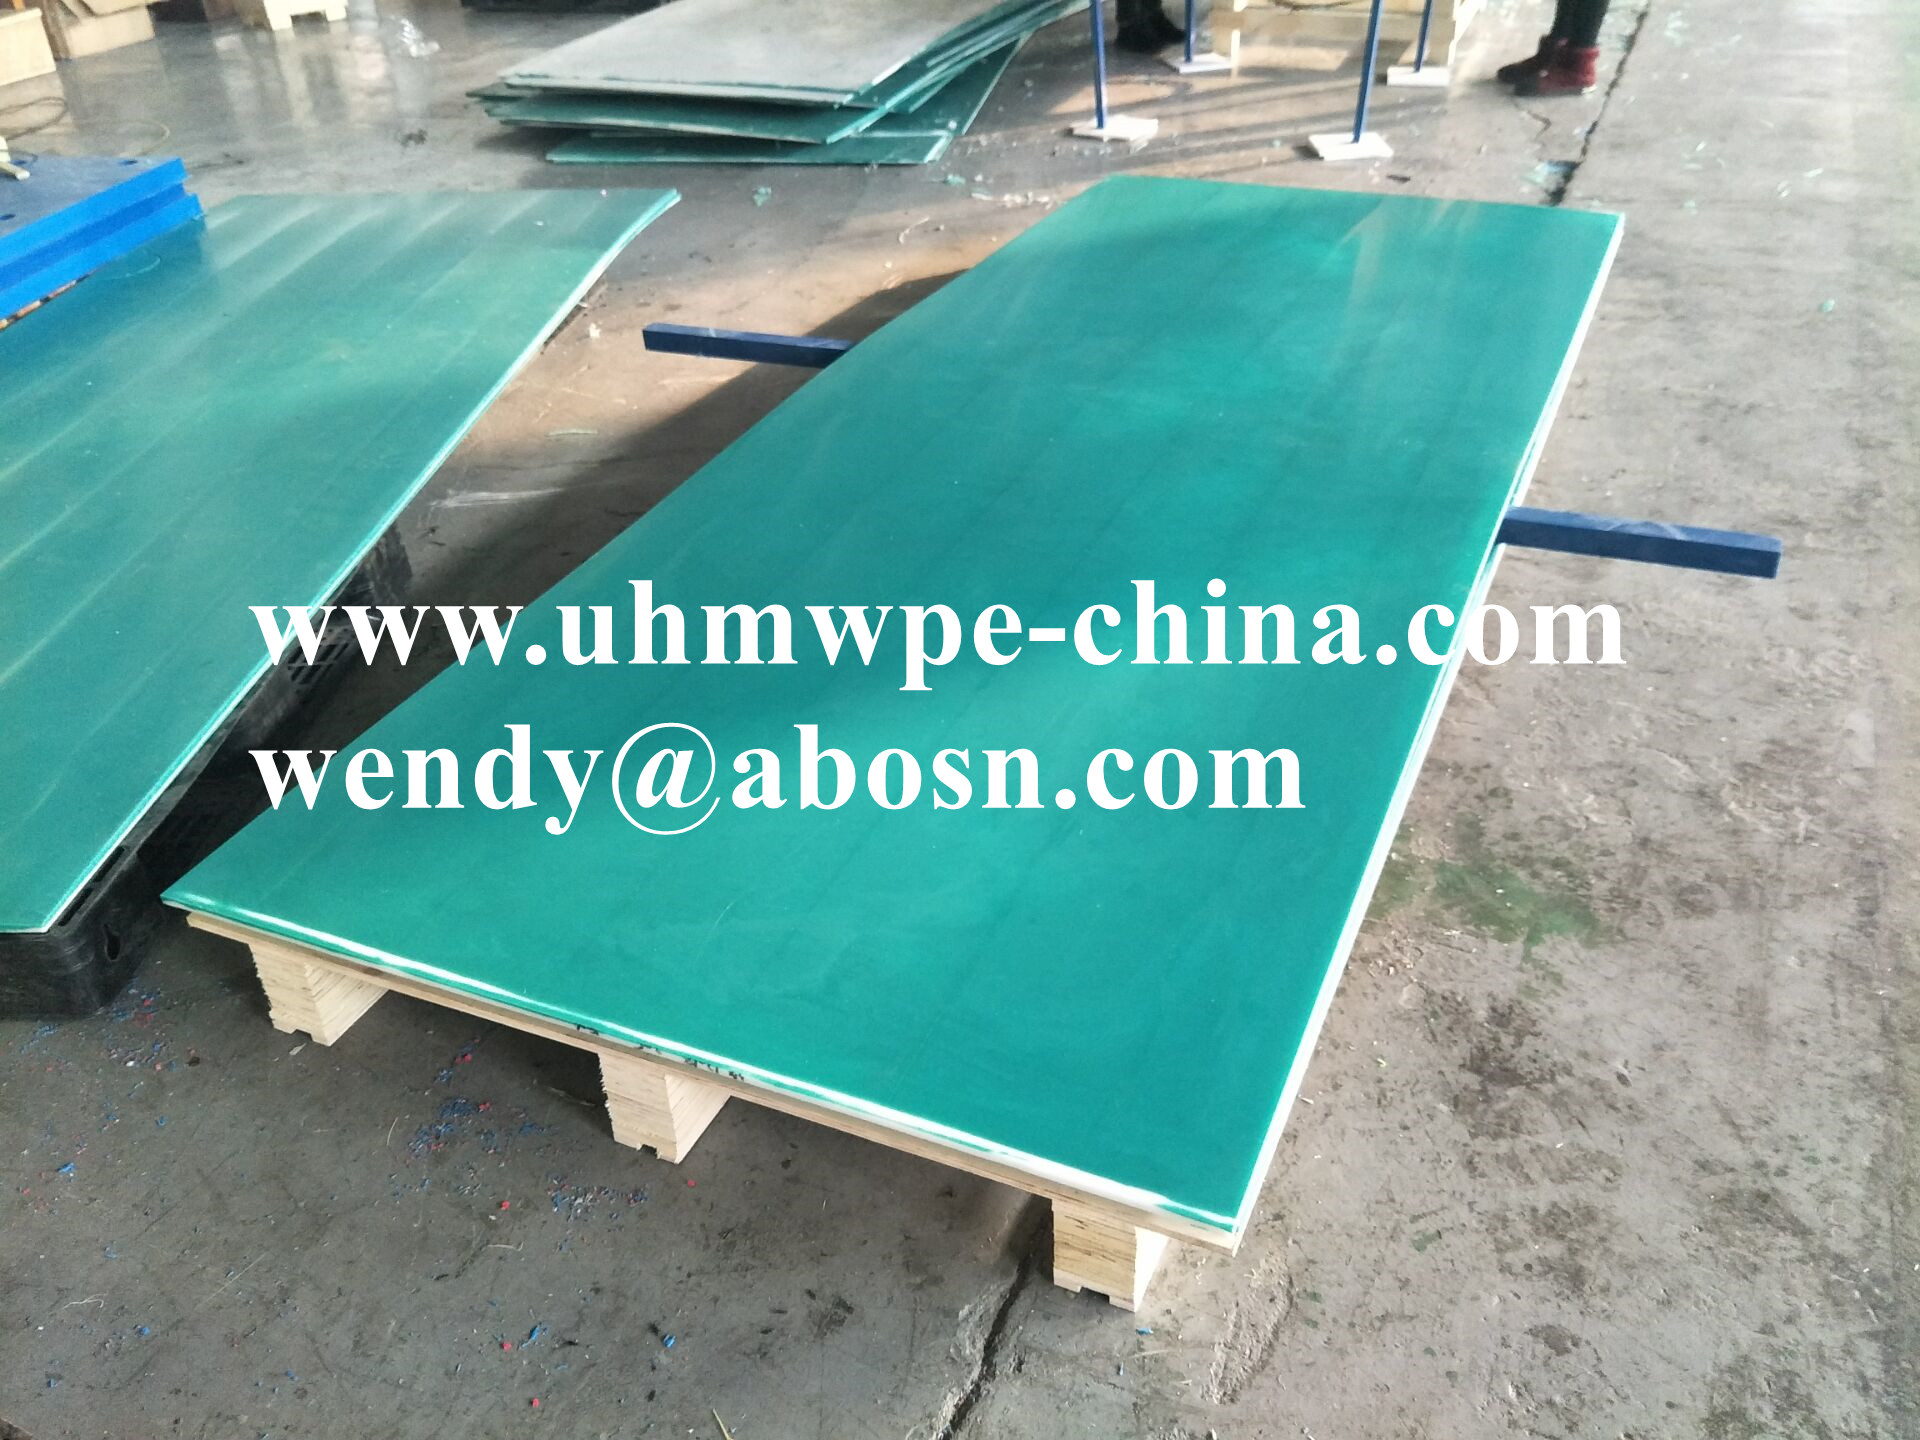 UHMWPE Ultra High Molecular Weight Polyethylene (PE1000) Board